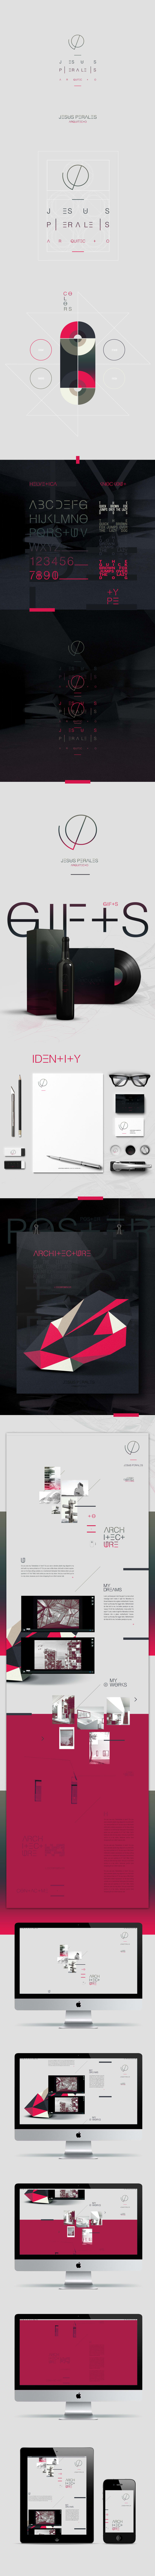 Jesus Perales Arquitecto - Branding -1